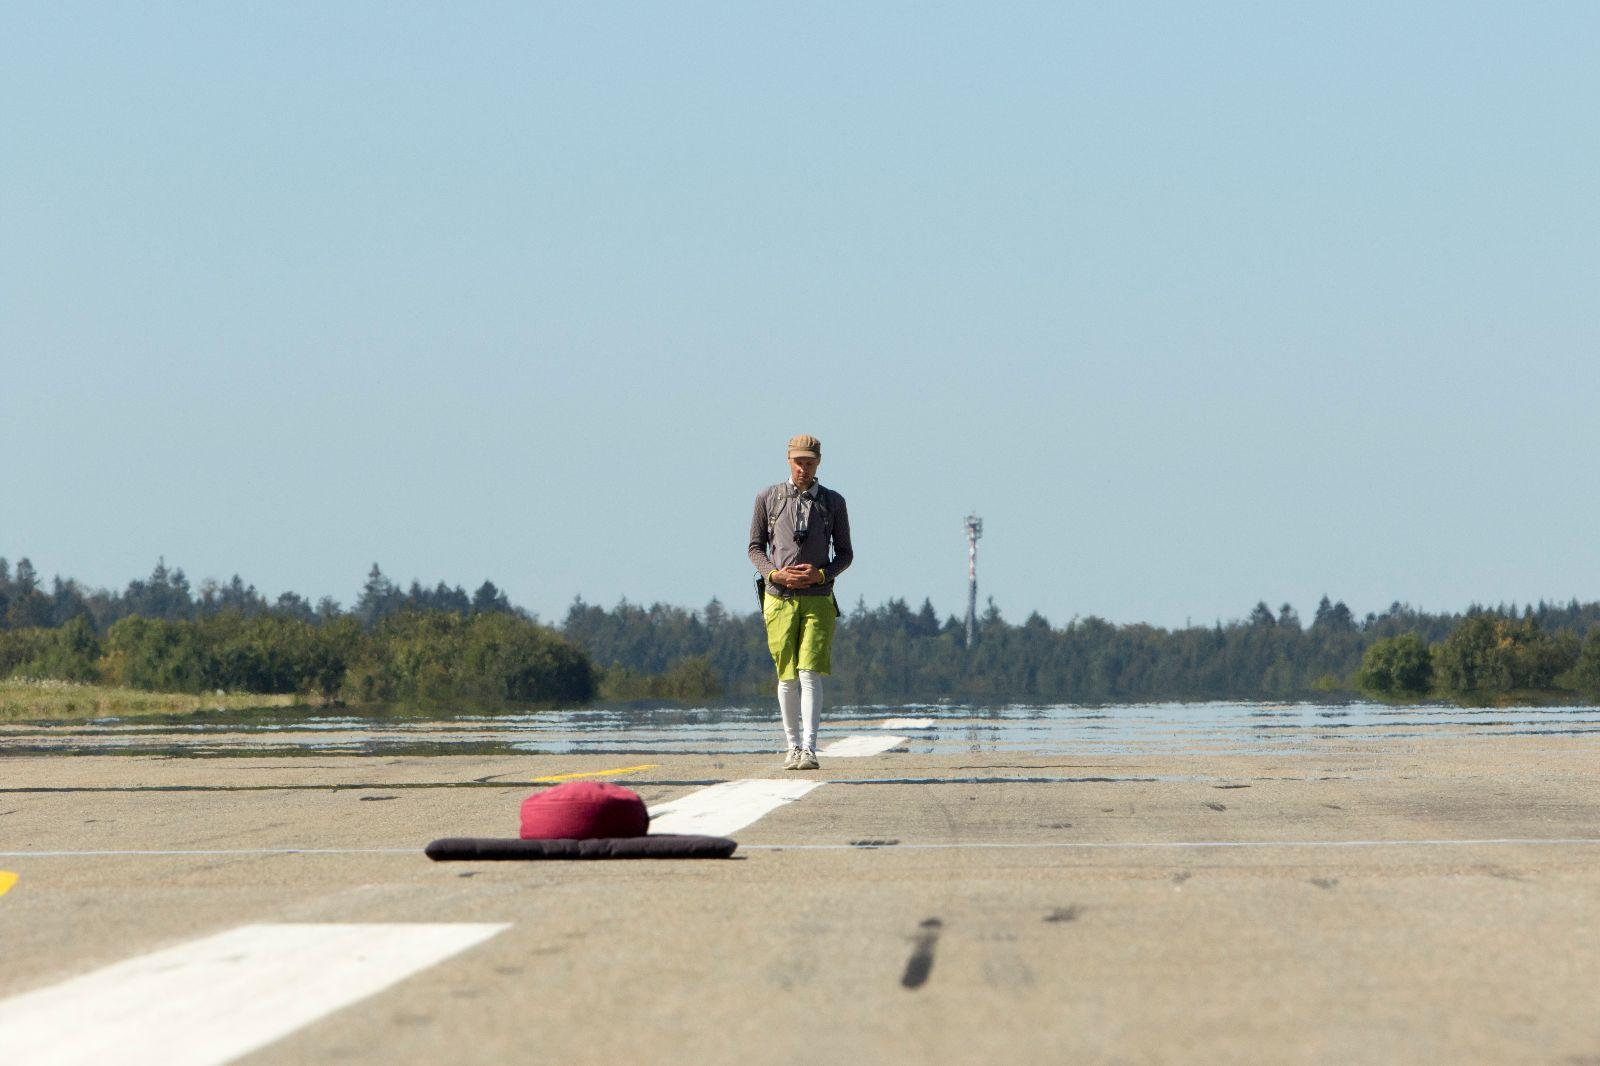 Daniel Beerstecher, Walk-in-time – Zieleinlauf